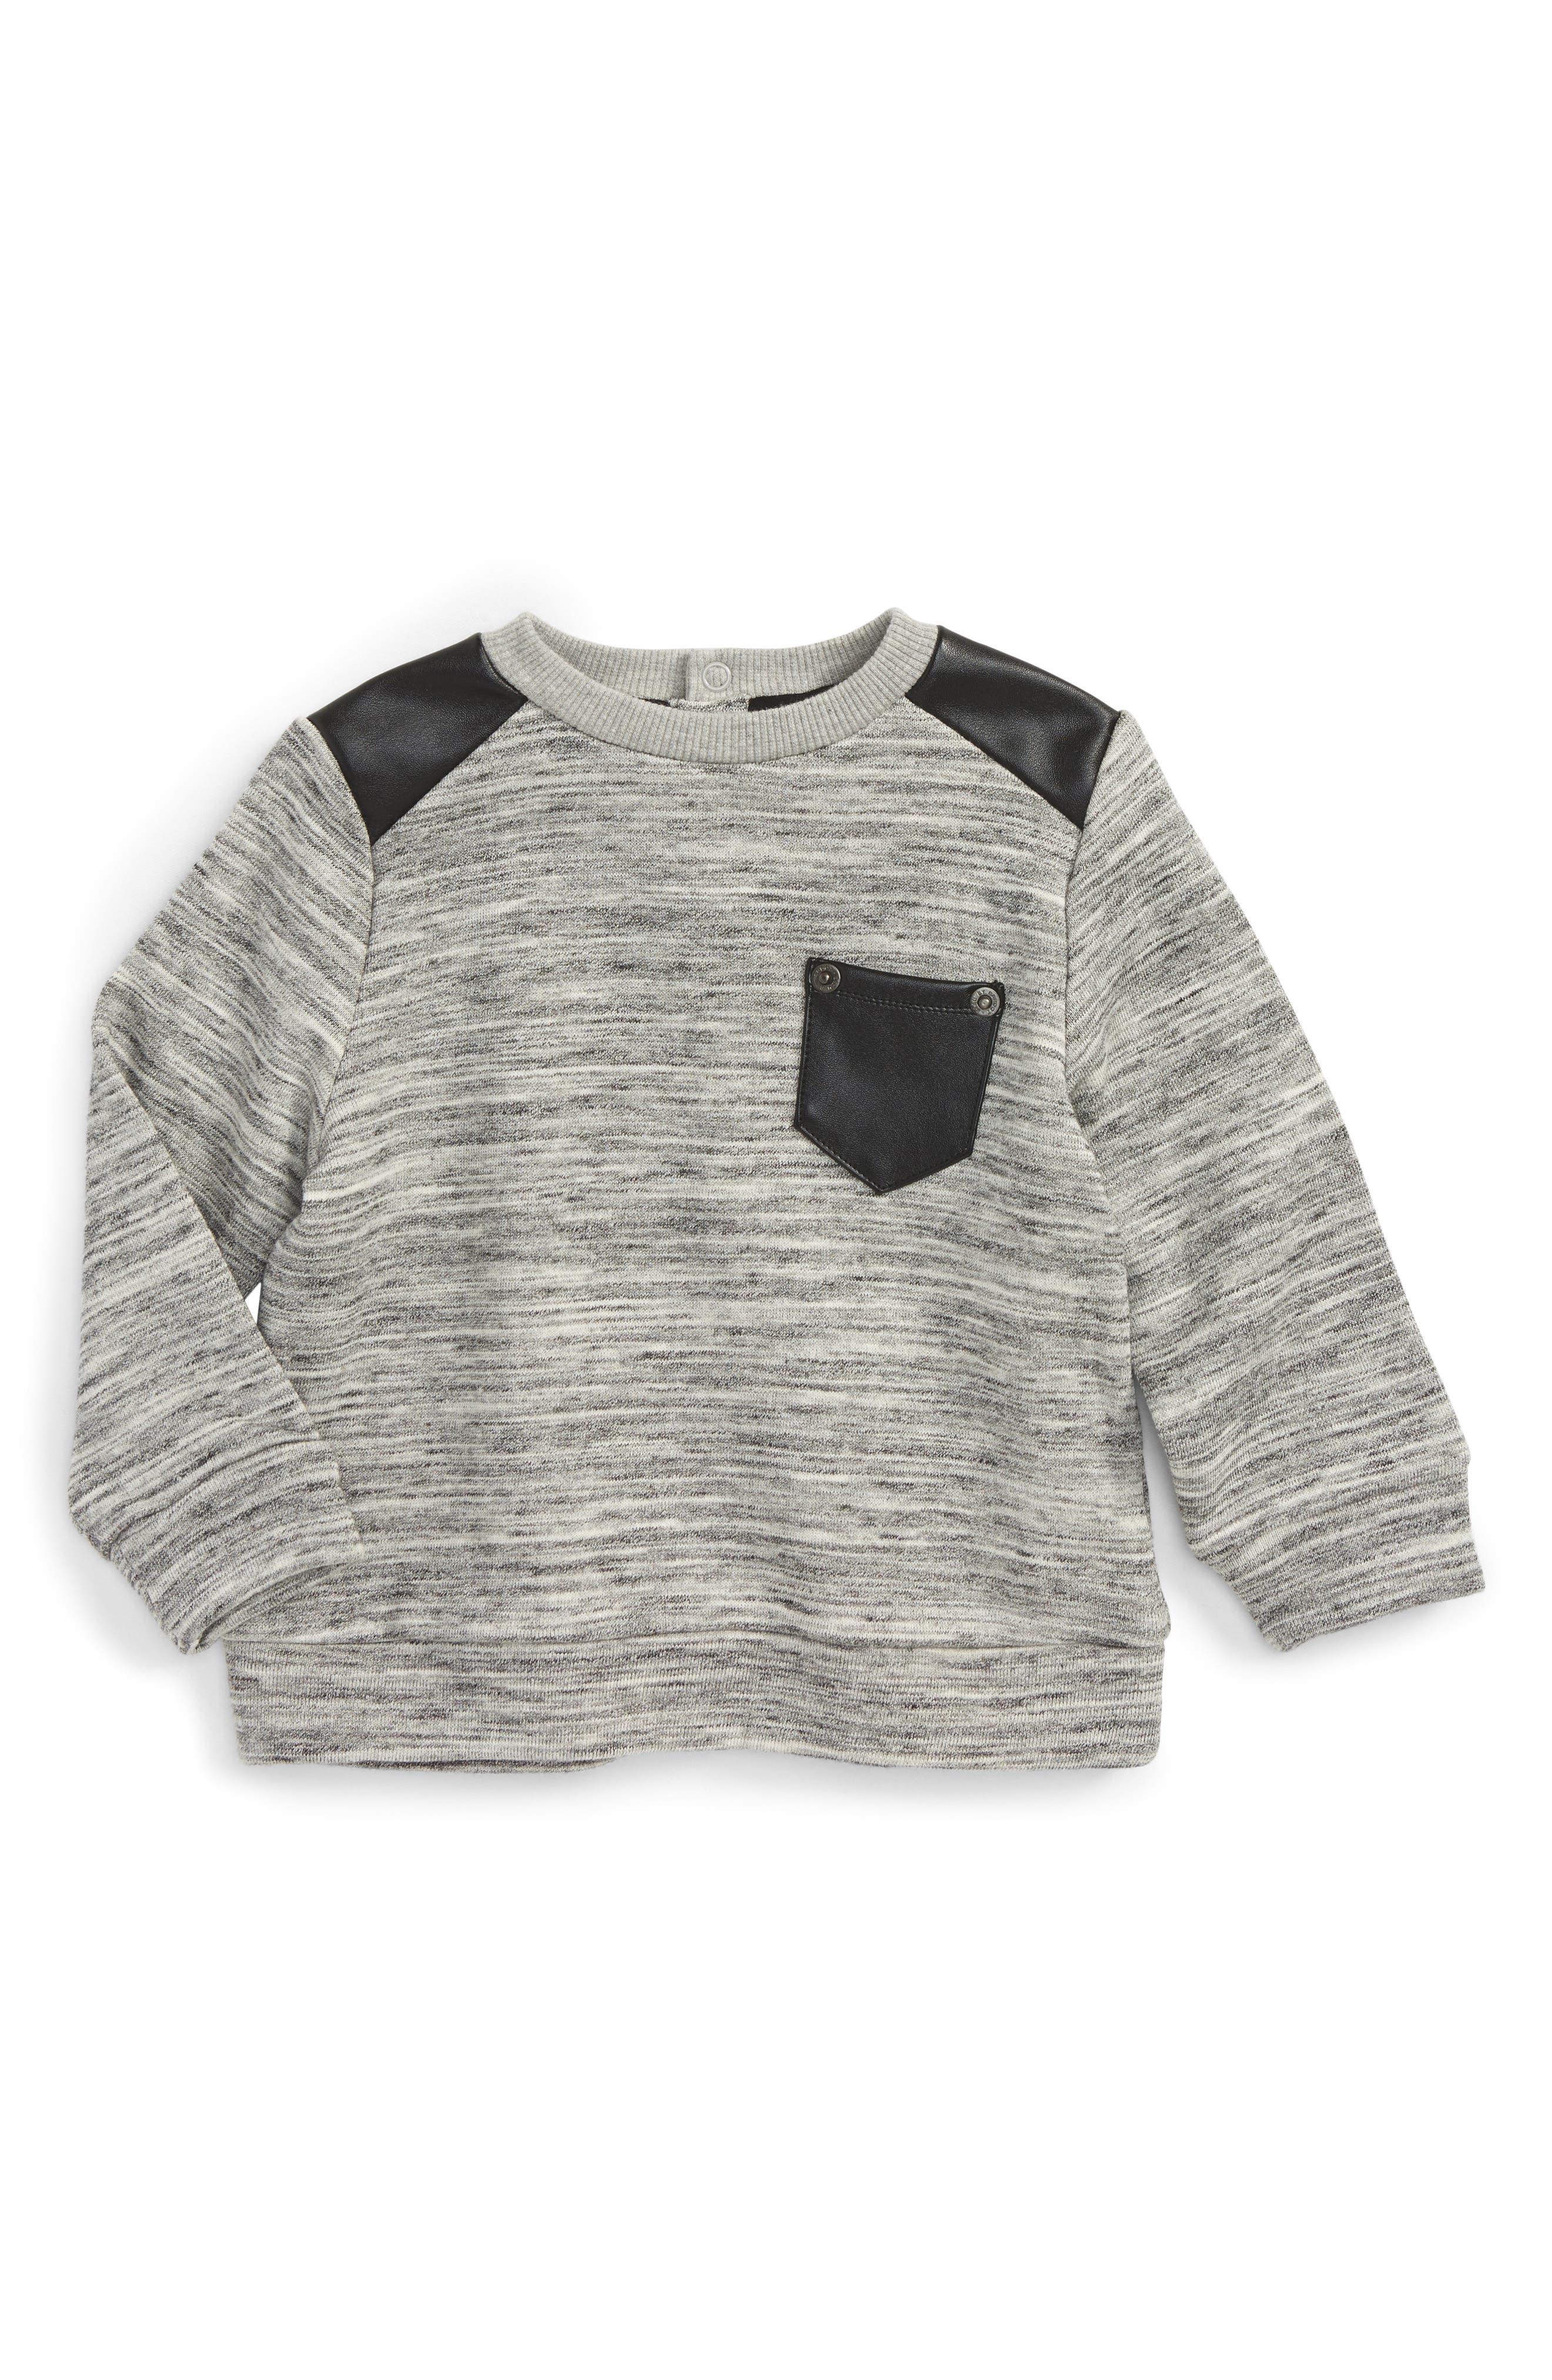 Moto Sweater,                         Main,                         color,